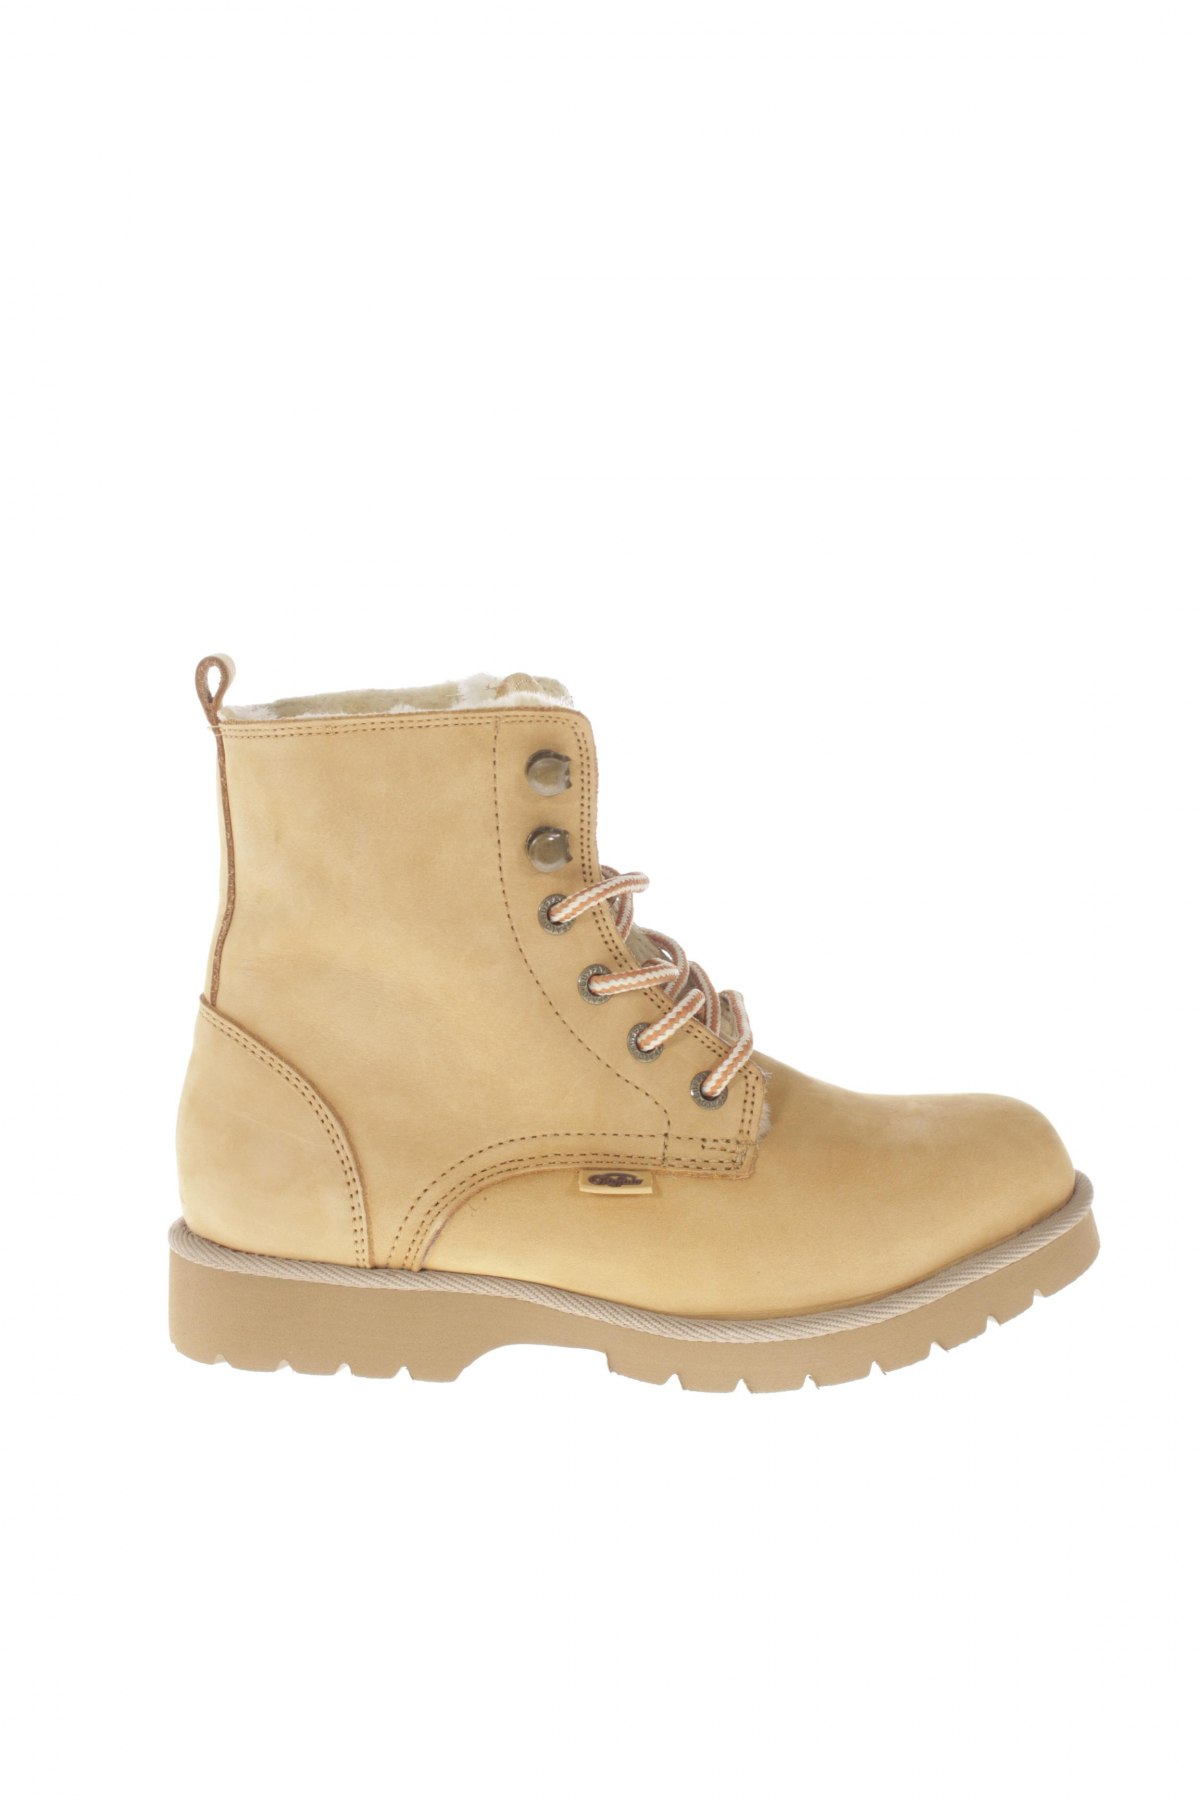 women 39 s ankle boots buffalo 7799965 remix. Black Bedroom Furniture Sets. Home Design Ideas